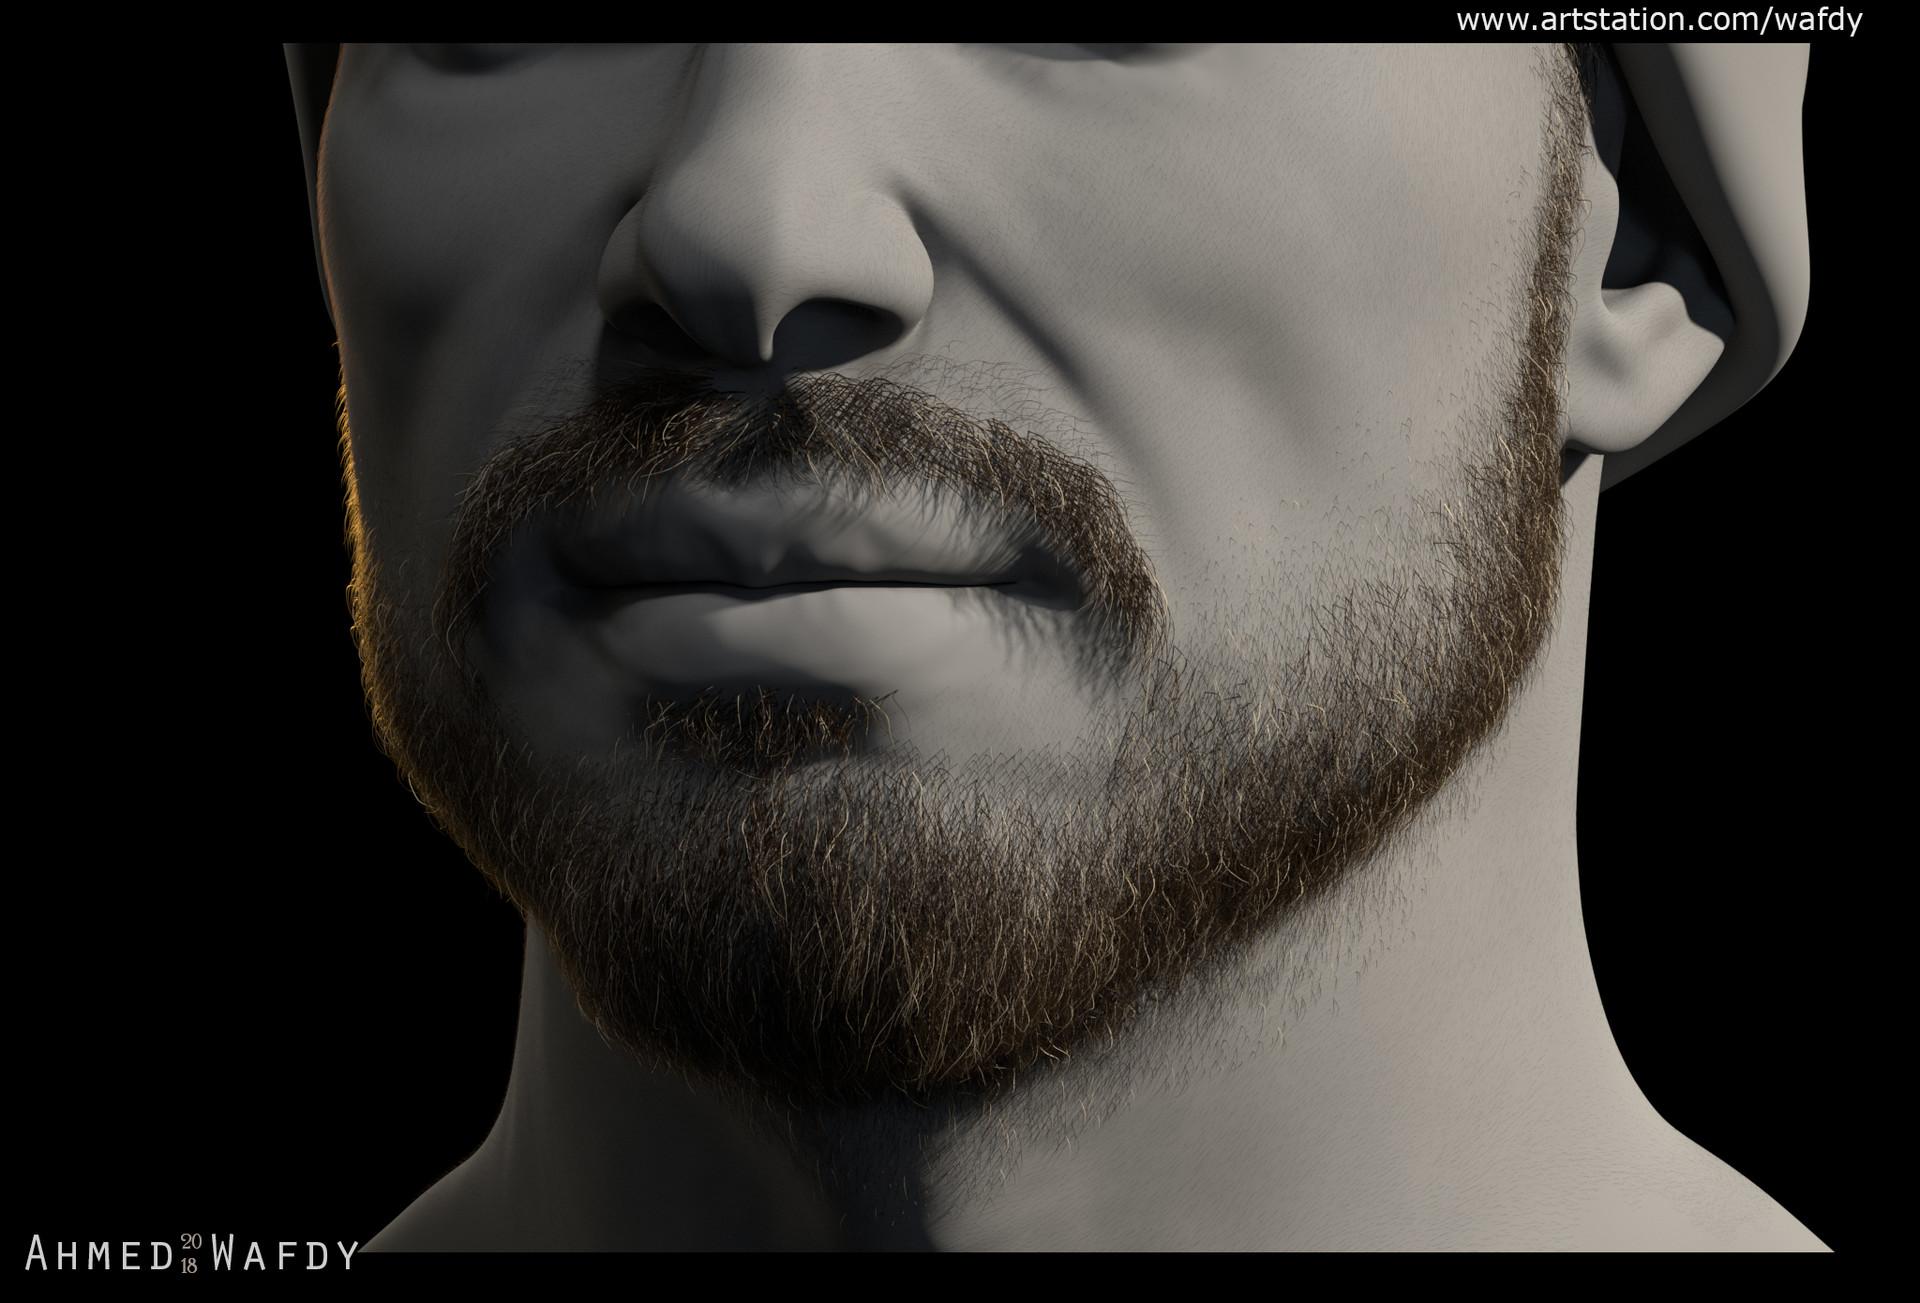 [Image: ahmed-wafdy-ahmed-wafdy-xgen-beard.jpg?1514933587]